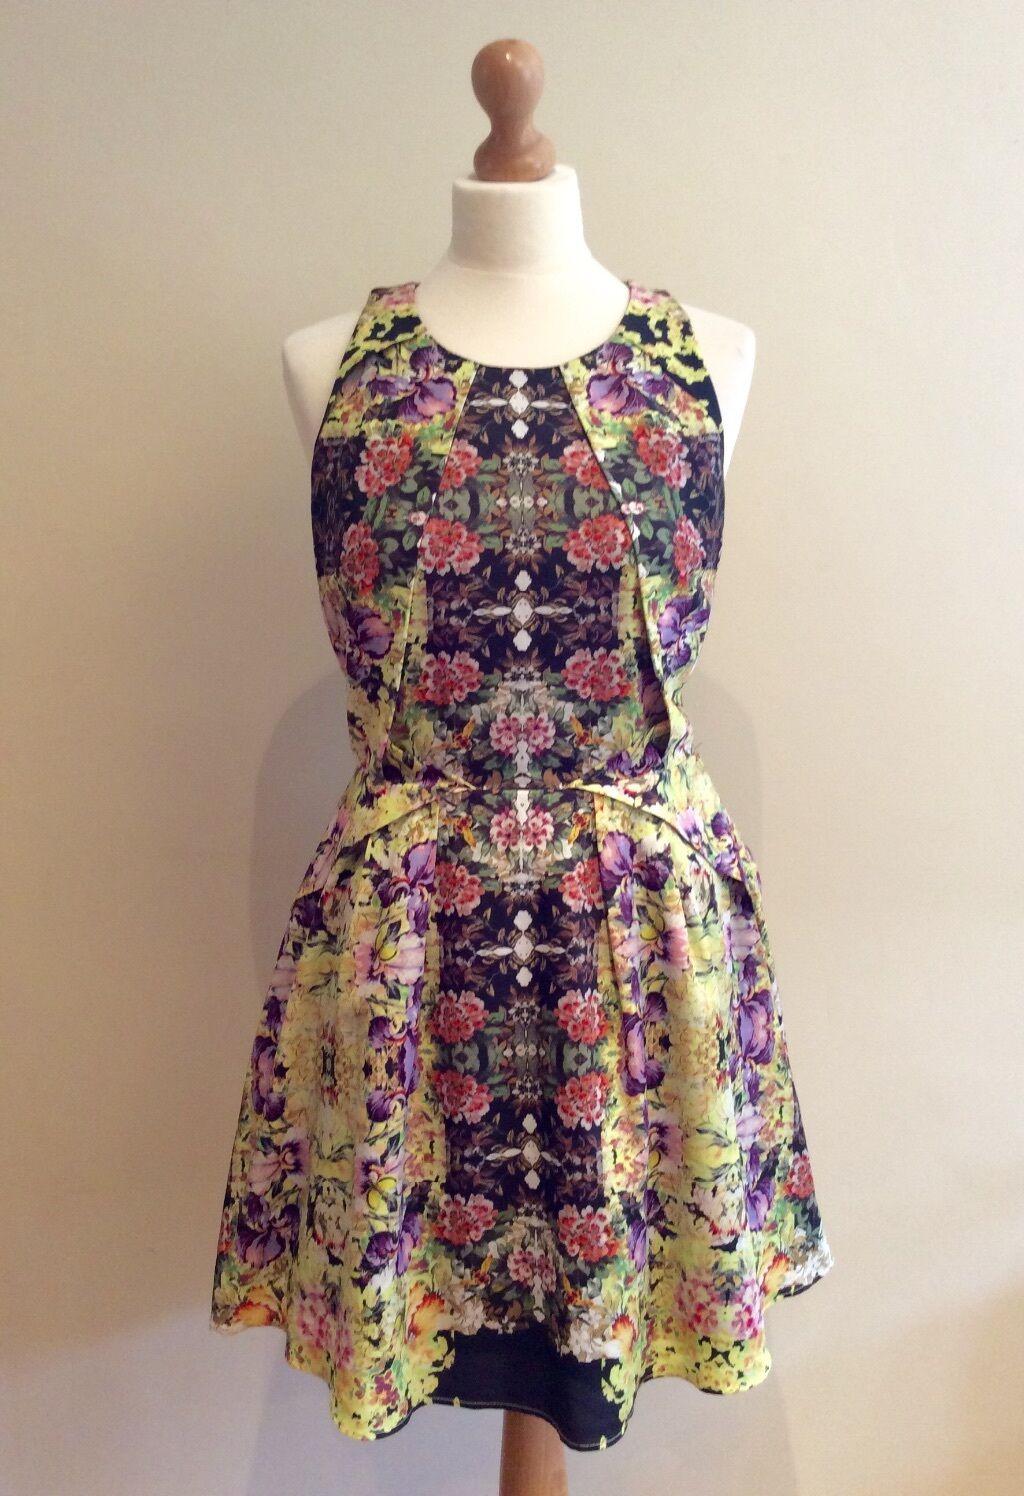 TOPSHOP Gelb FLORAL DRESS Größe 12